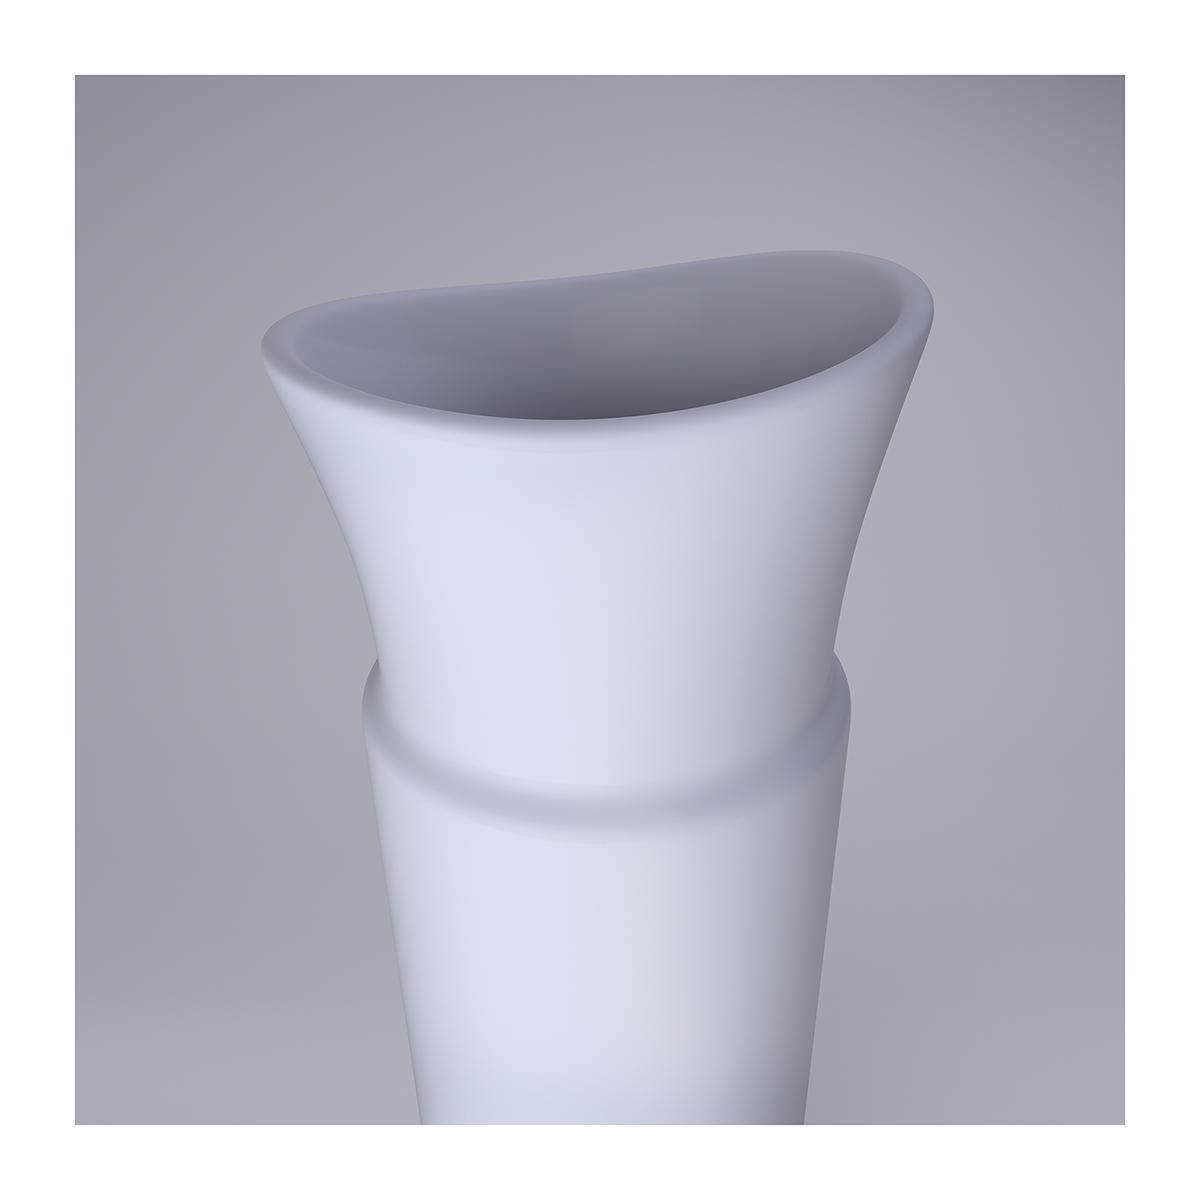 235 Lsdr TWHS Virtual Ceramics II 006 - 2021 - La simplicité du regard. This was HomoSapiens. Virtual Ceramics. II